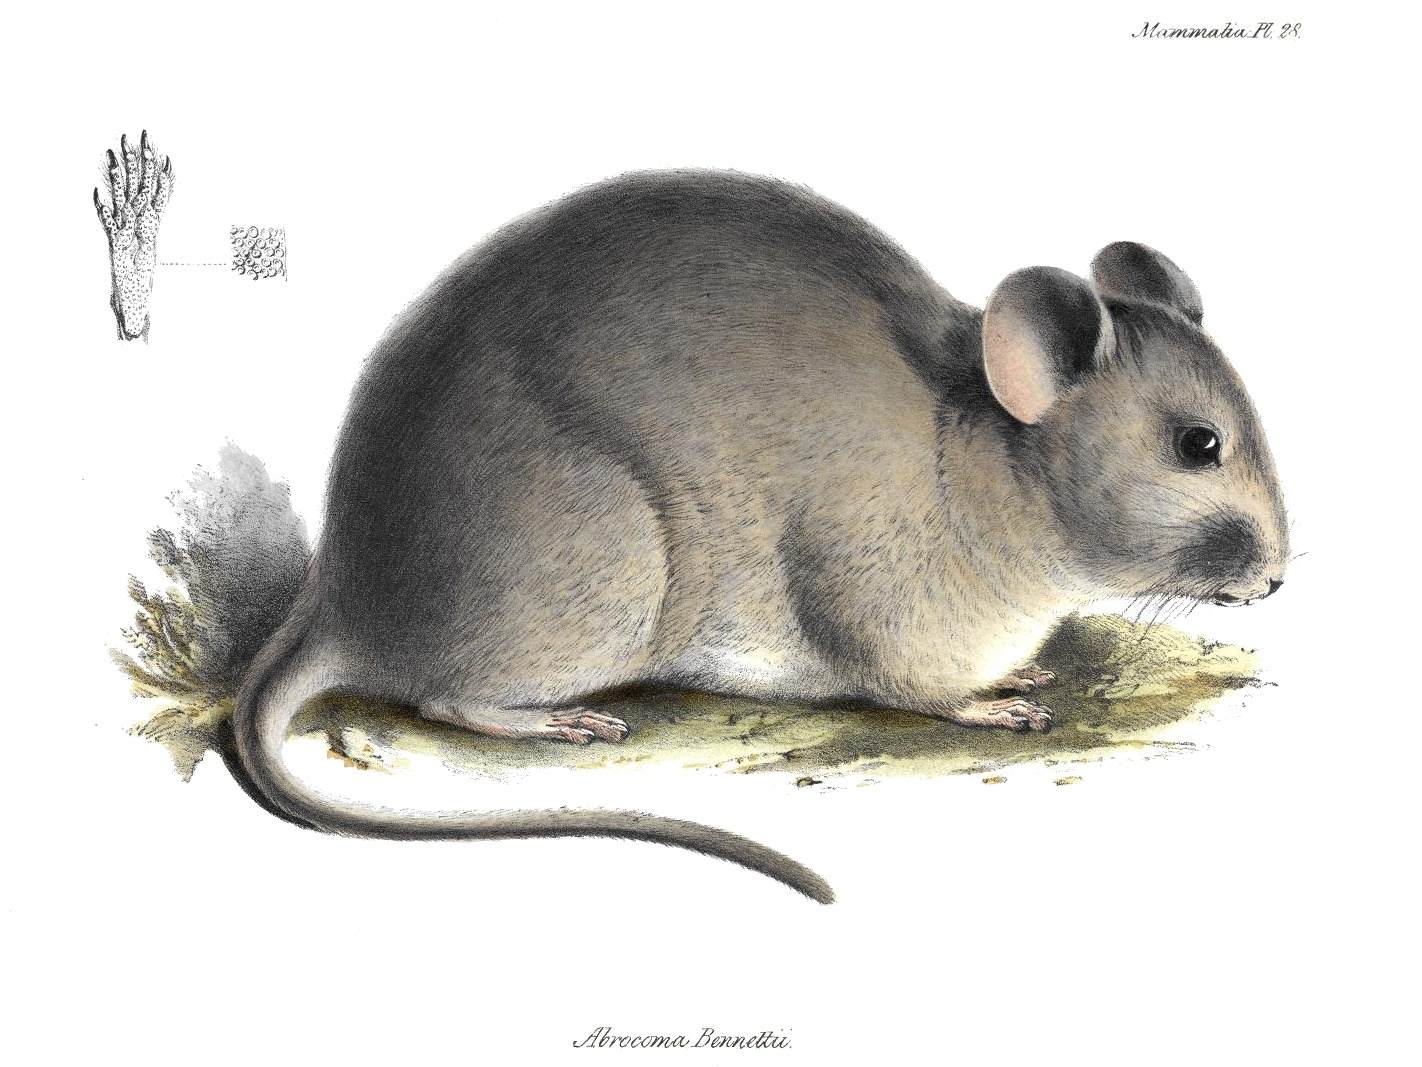 Image of Bennett's Chinchilla Rat